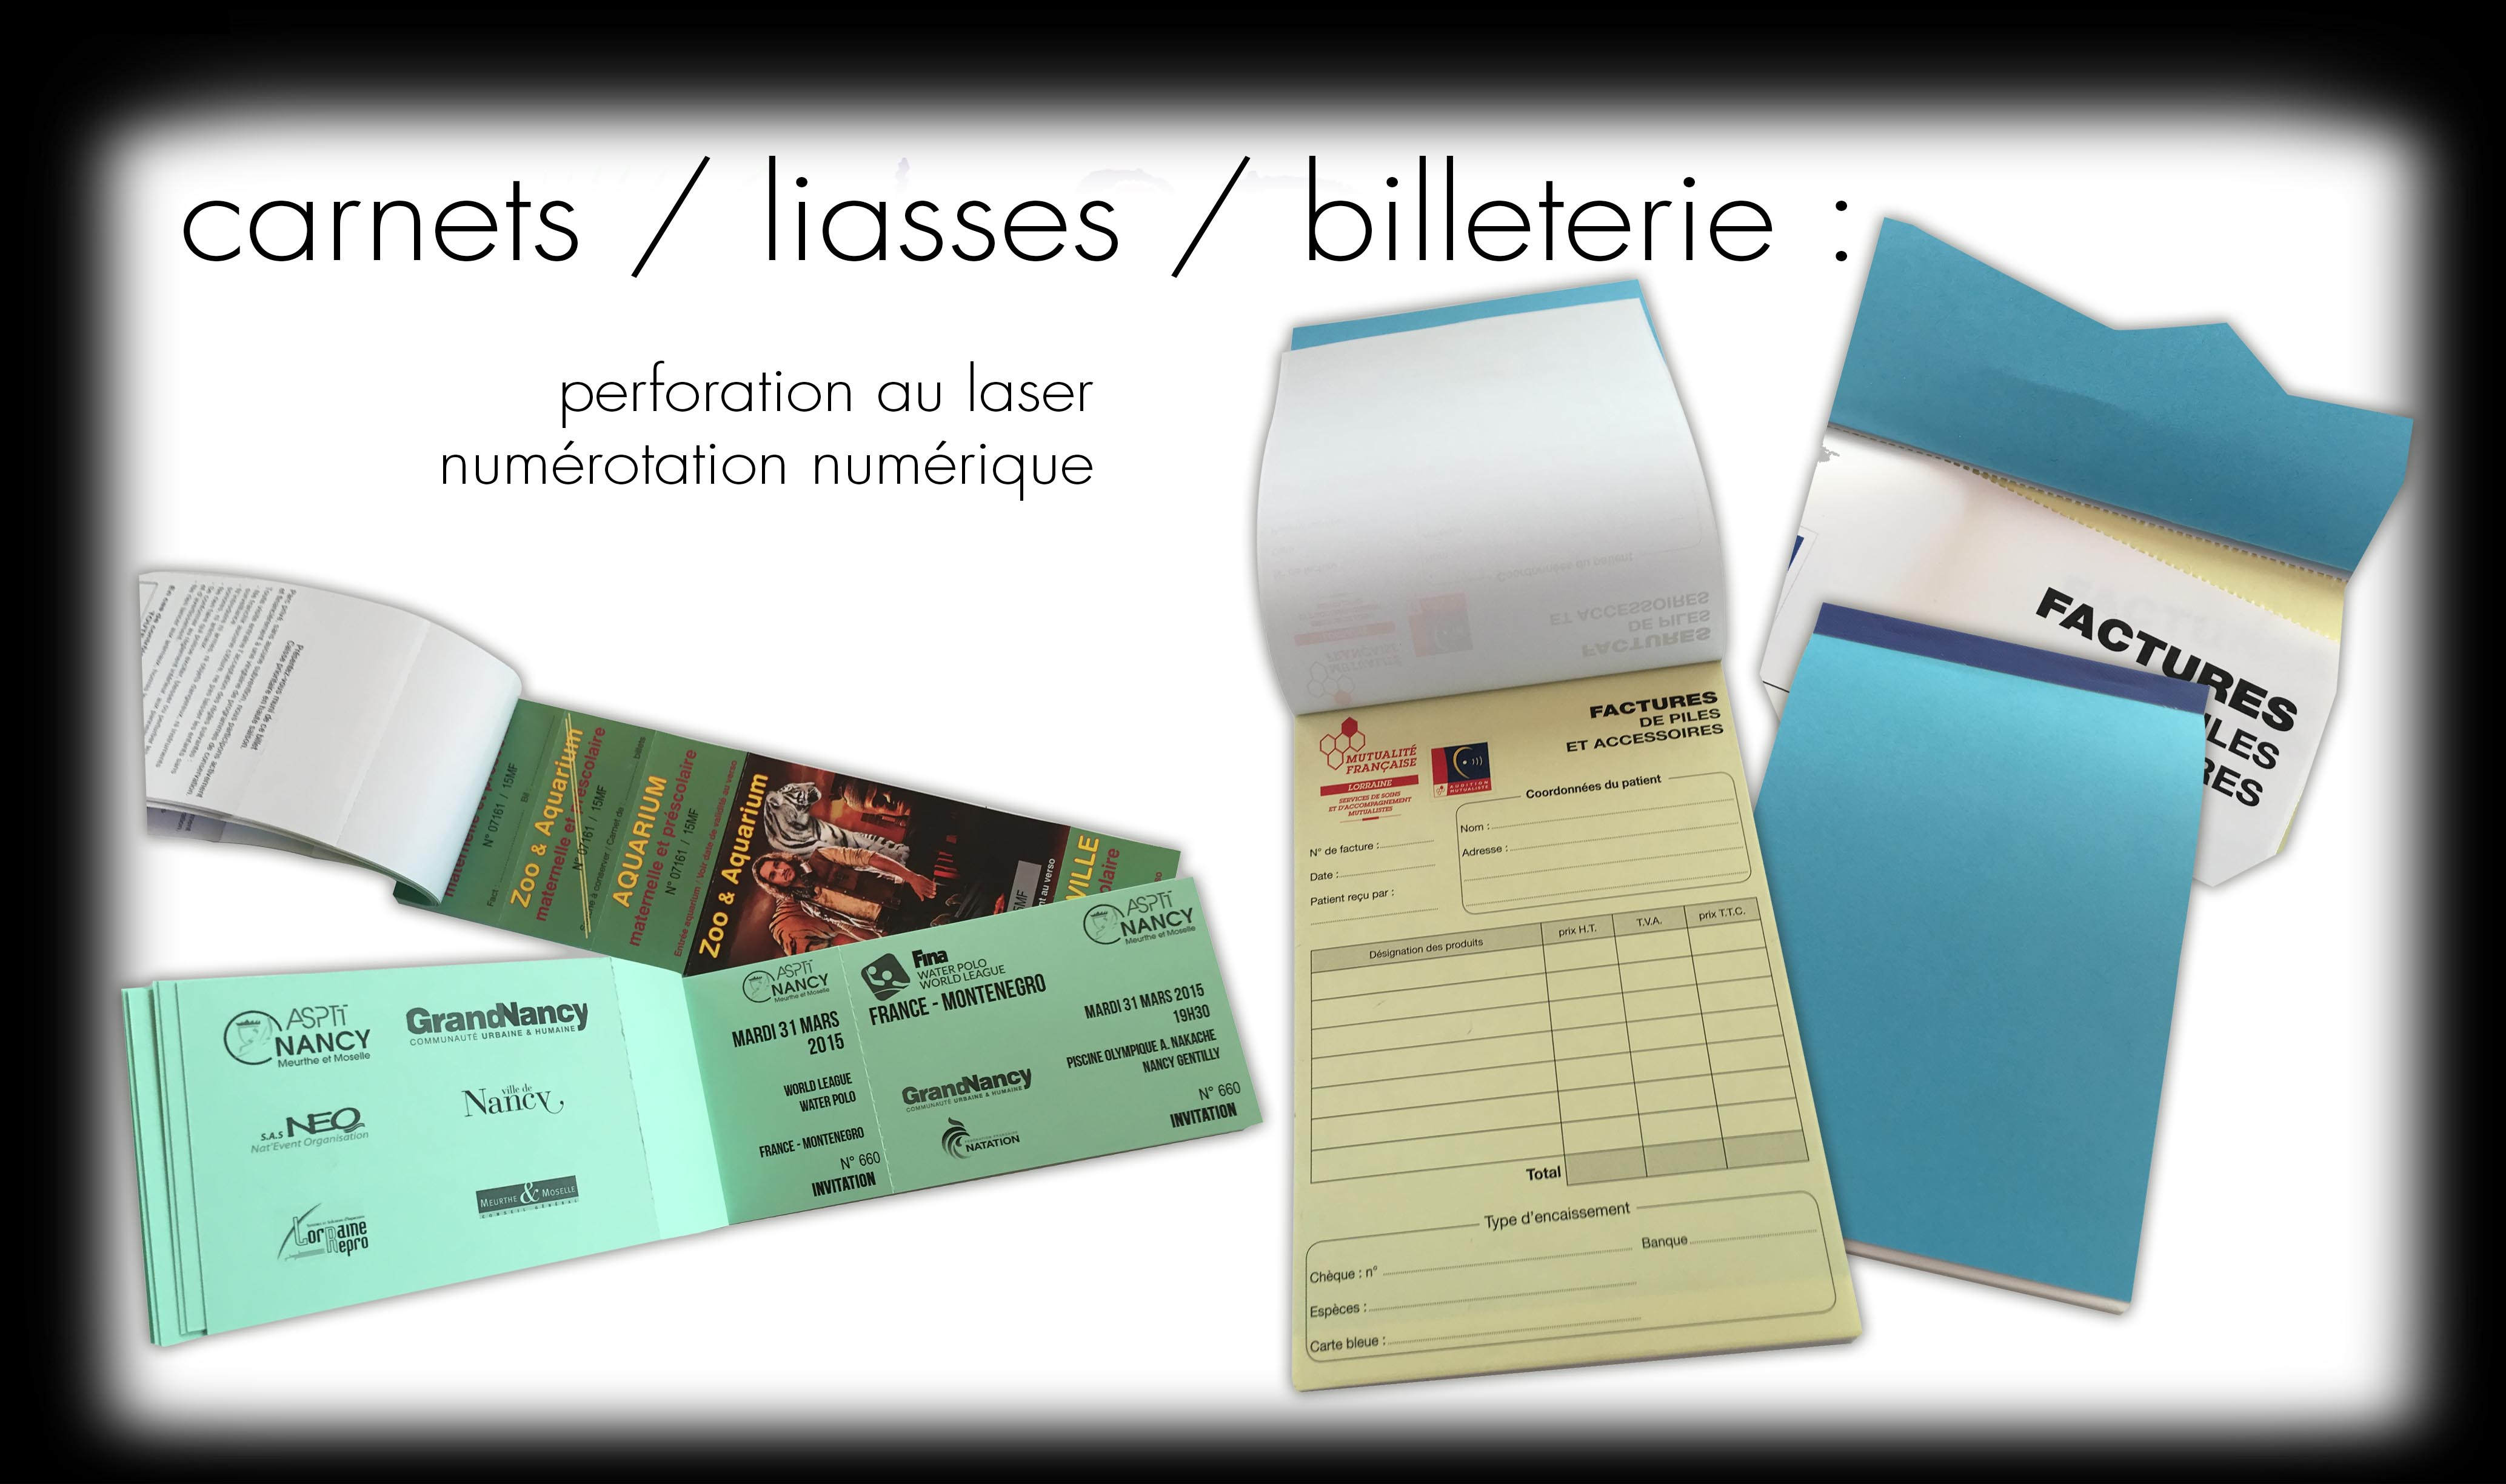 carnets / liasses / billeterie